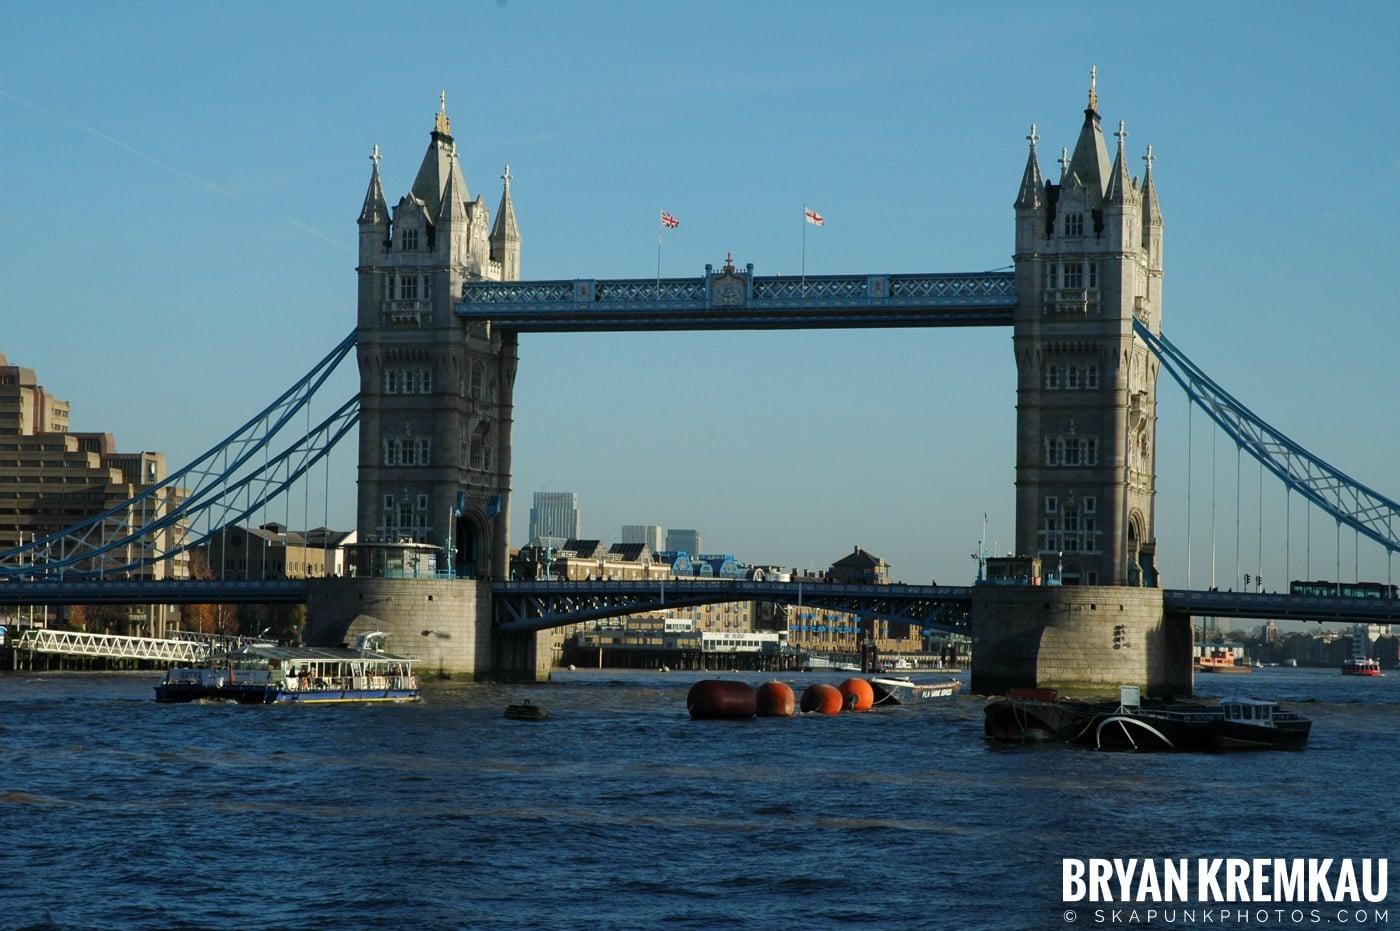 London, England - Day 4 - 12.19.05 (19)